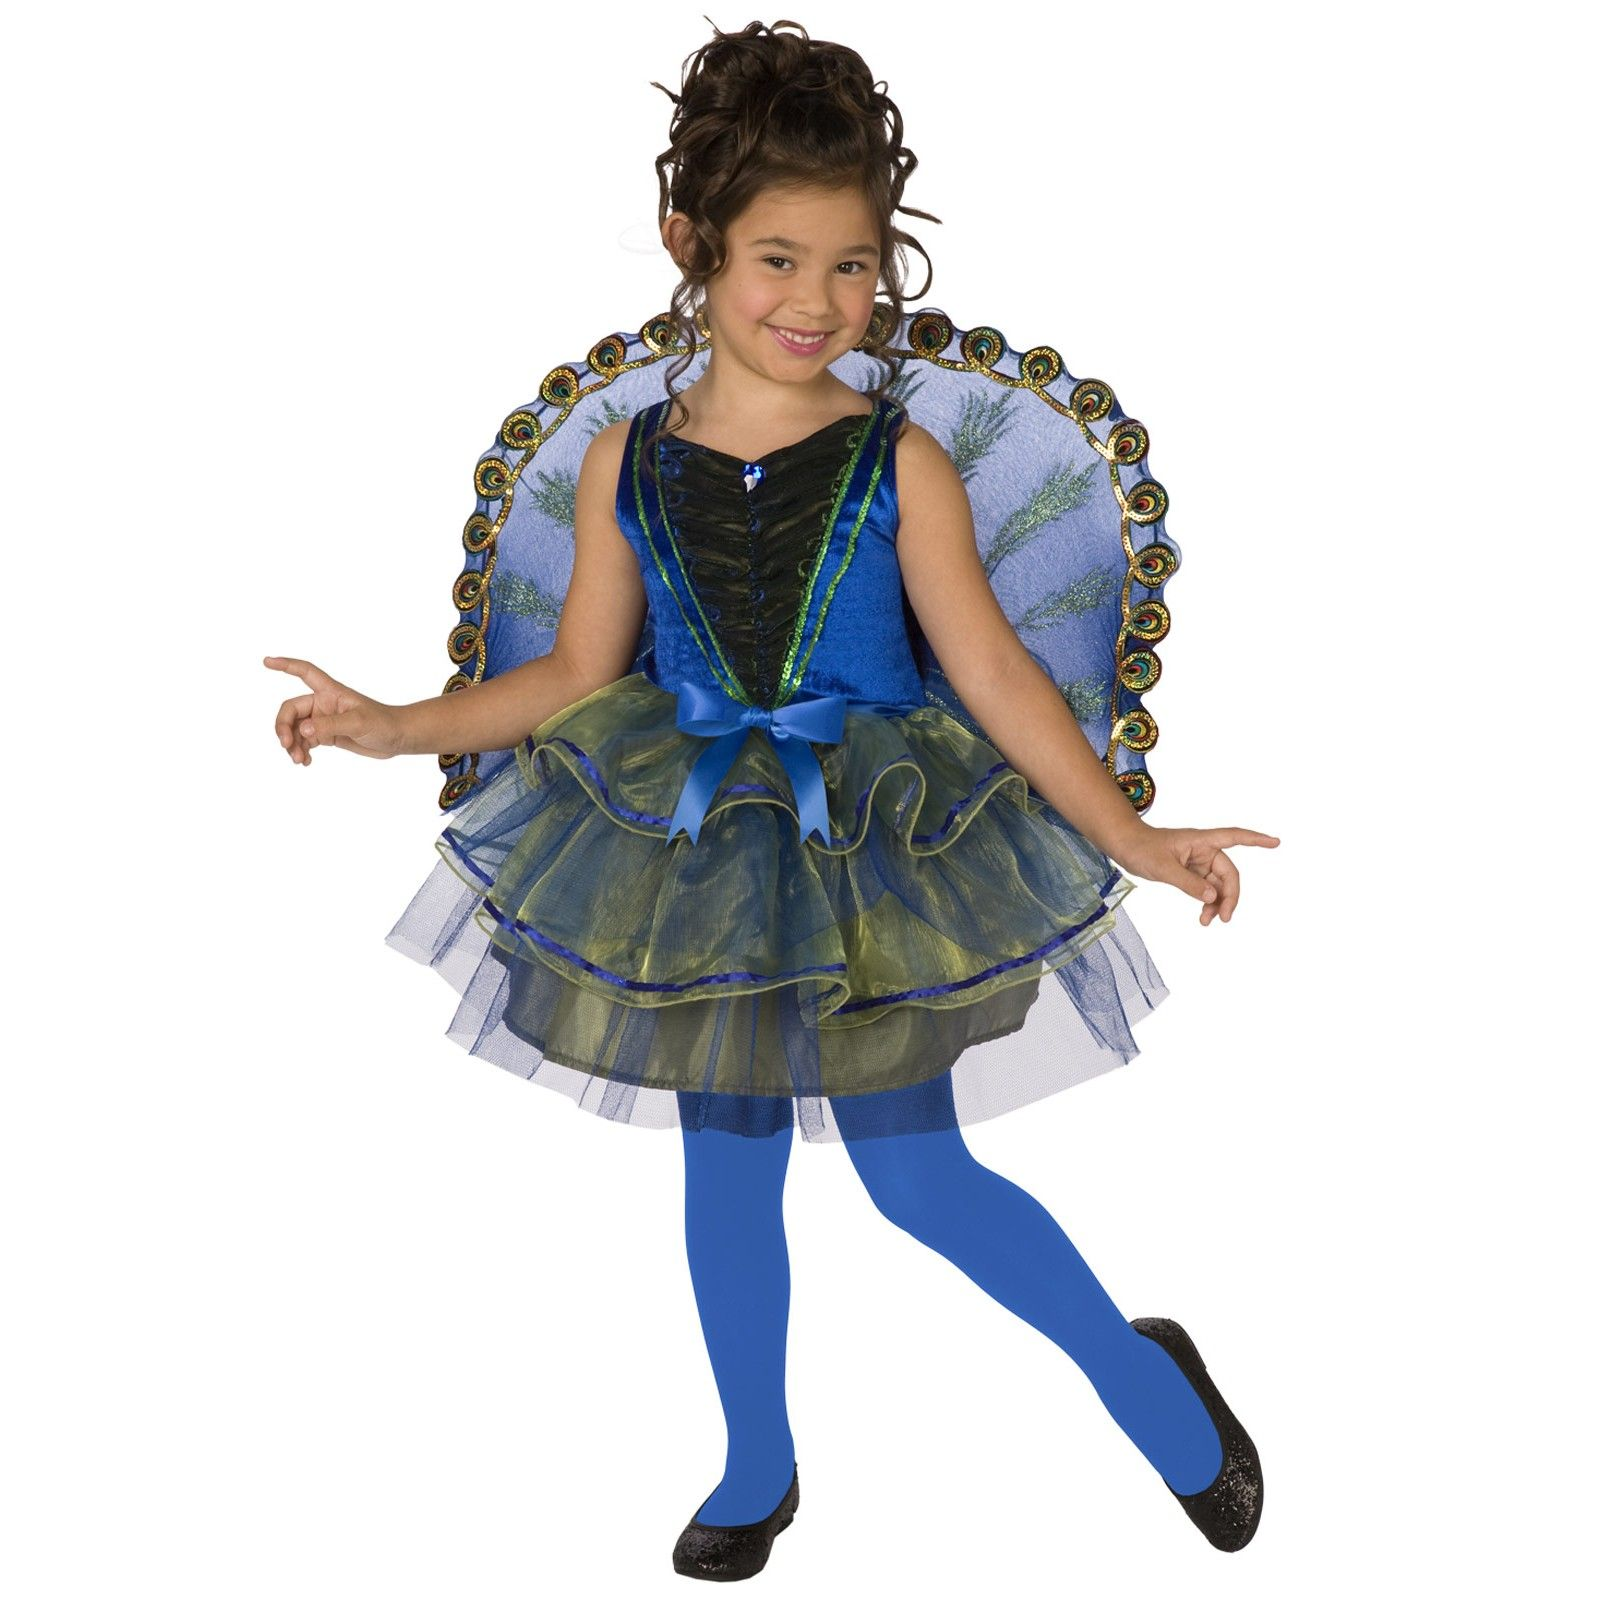 Pretty Peacock Child Costume $20  sc 1 st  Pinterest & Pretty Peacock Child Costume $20 | Cute Halloween costume ideas ...